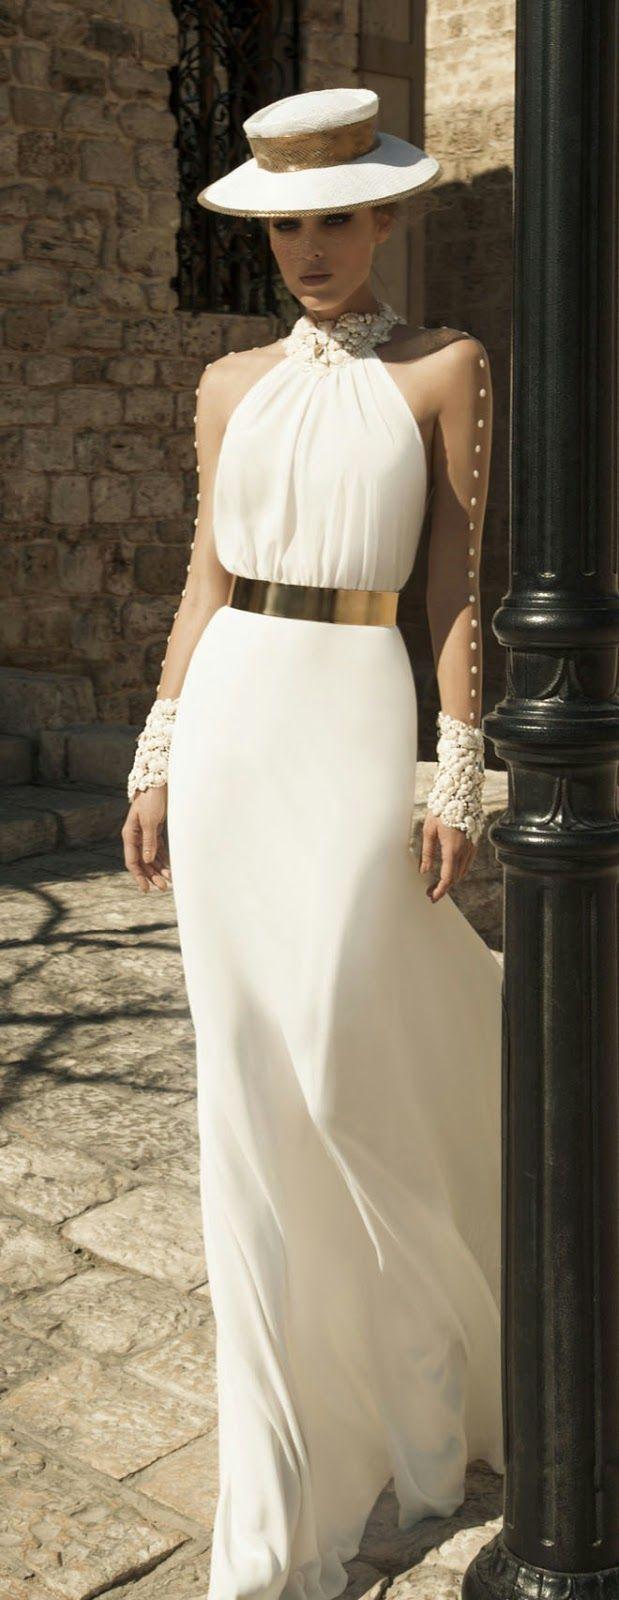 Best of Galia Lahav Wedding Dresses. To see more: http://www.modwedding.com/2014/06/15/best-of-galia-lahav-wedding-dresses/ #wedding #weddings #galiaLahav: